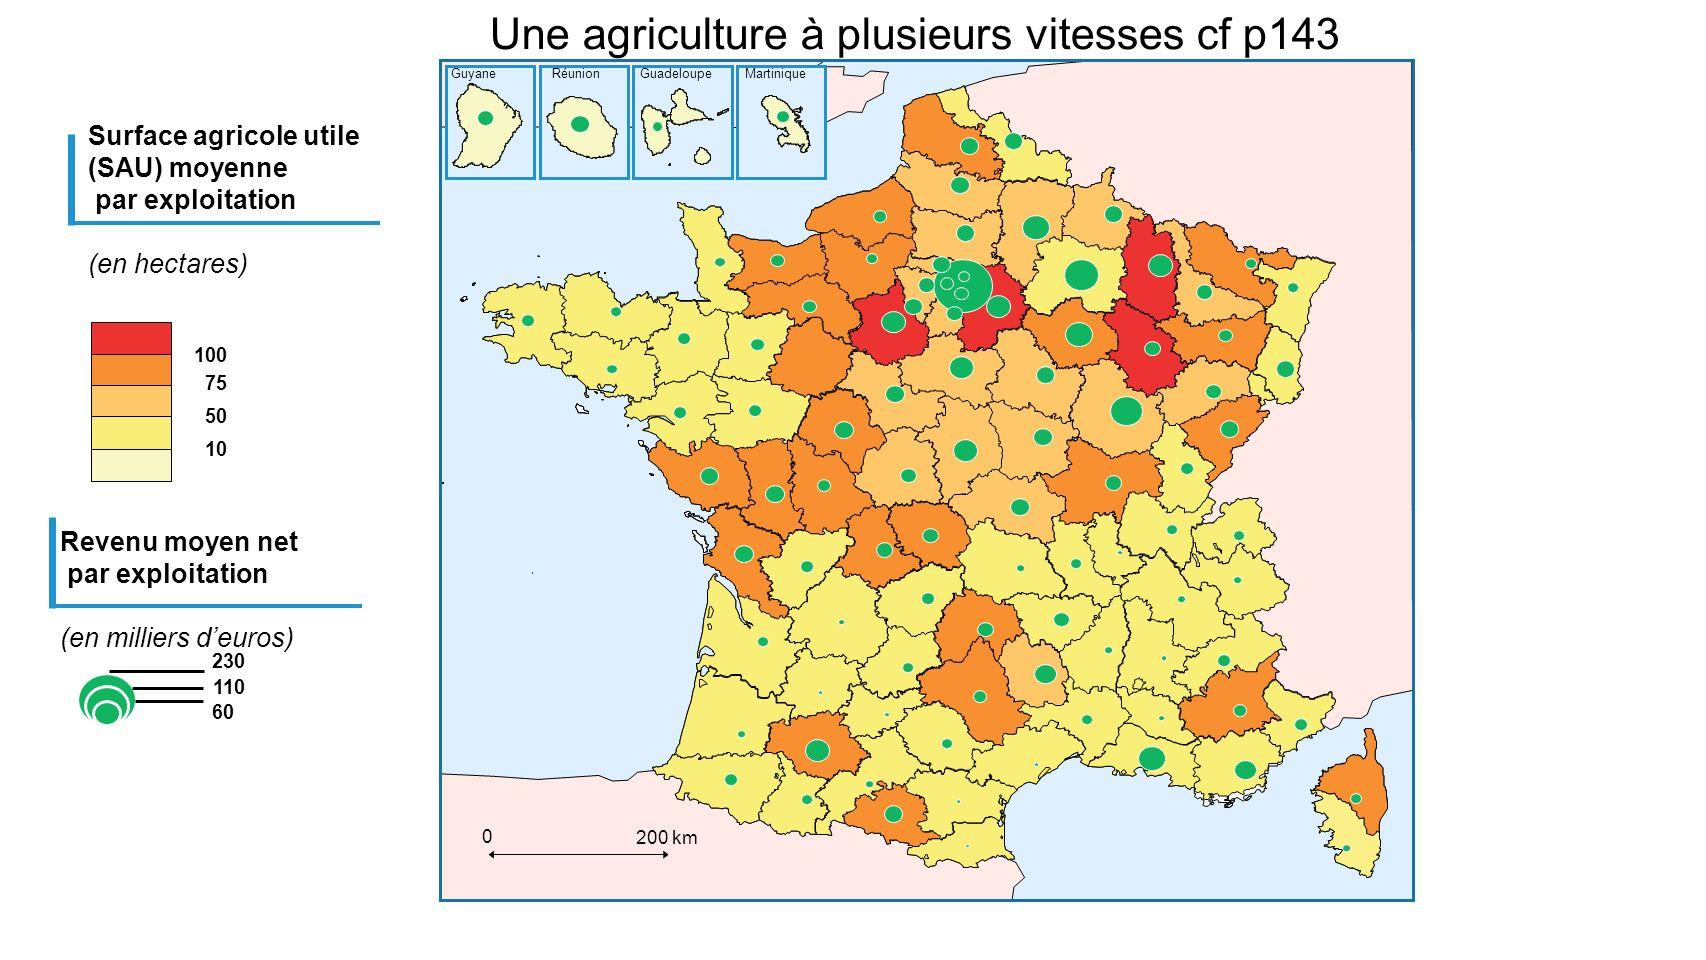 Guadeloupe MartiniqueRéunionGuyane Surface agricole utile (SAU) moyenne par exploitation (en hectares) 100 75 50 10 Revenu moyen net par exploitation